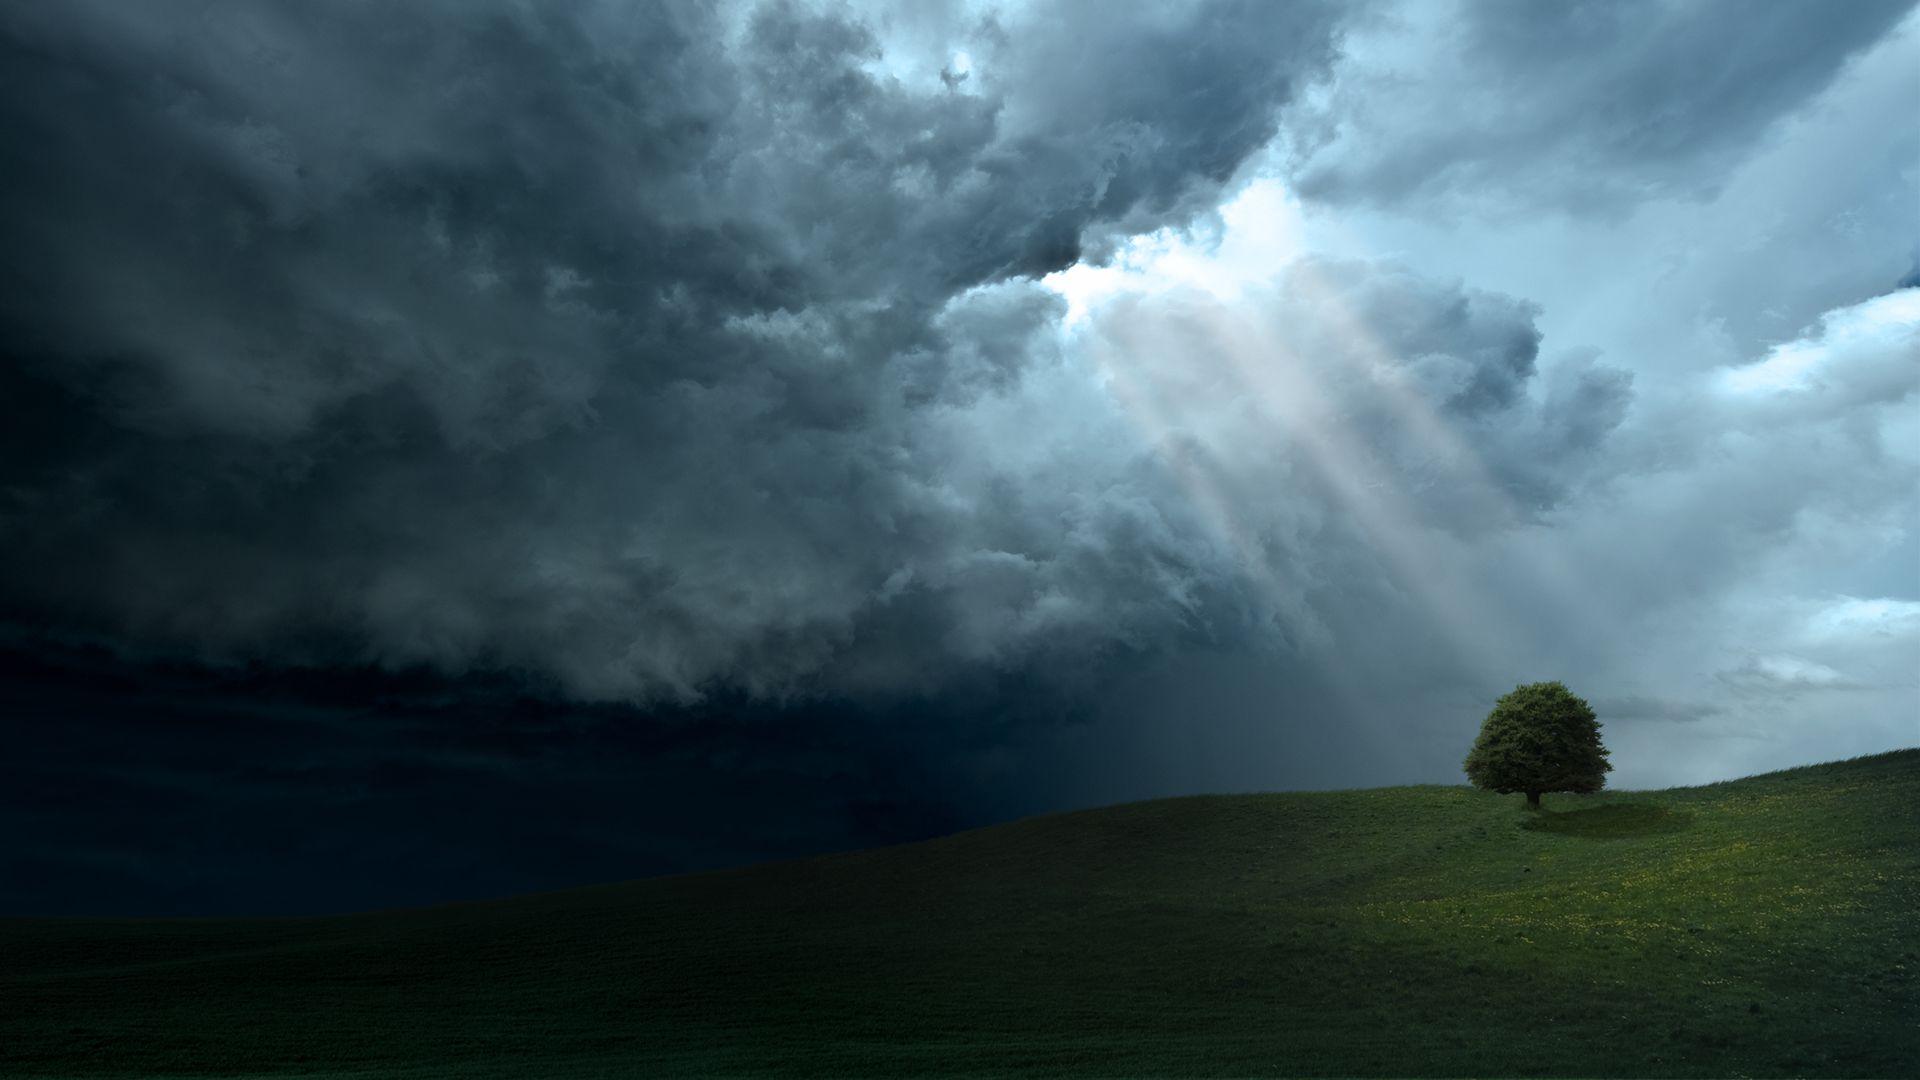 Dark Clouds wallpaper download